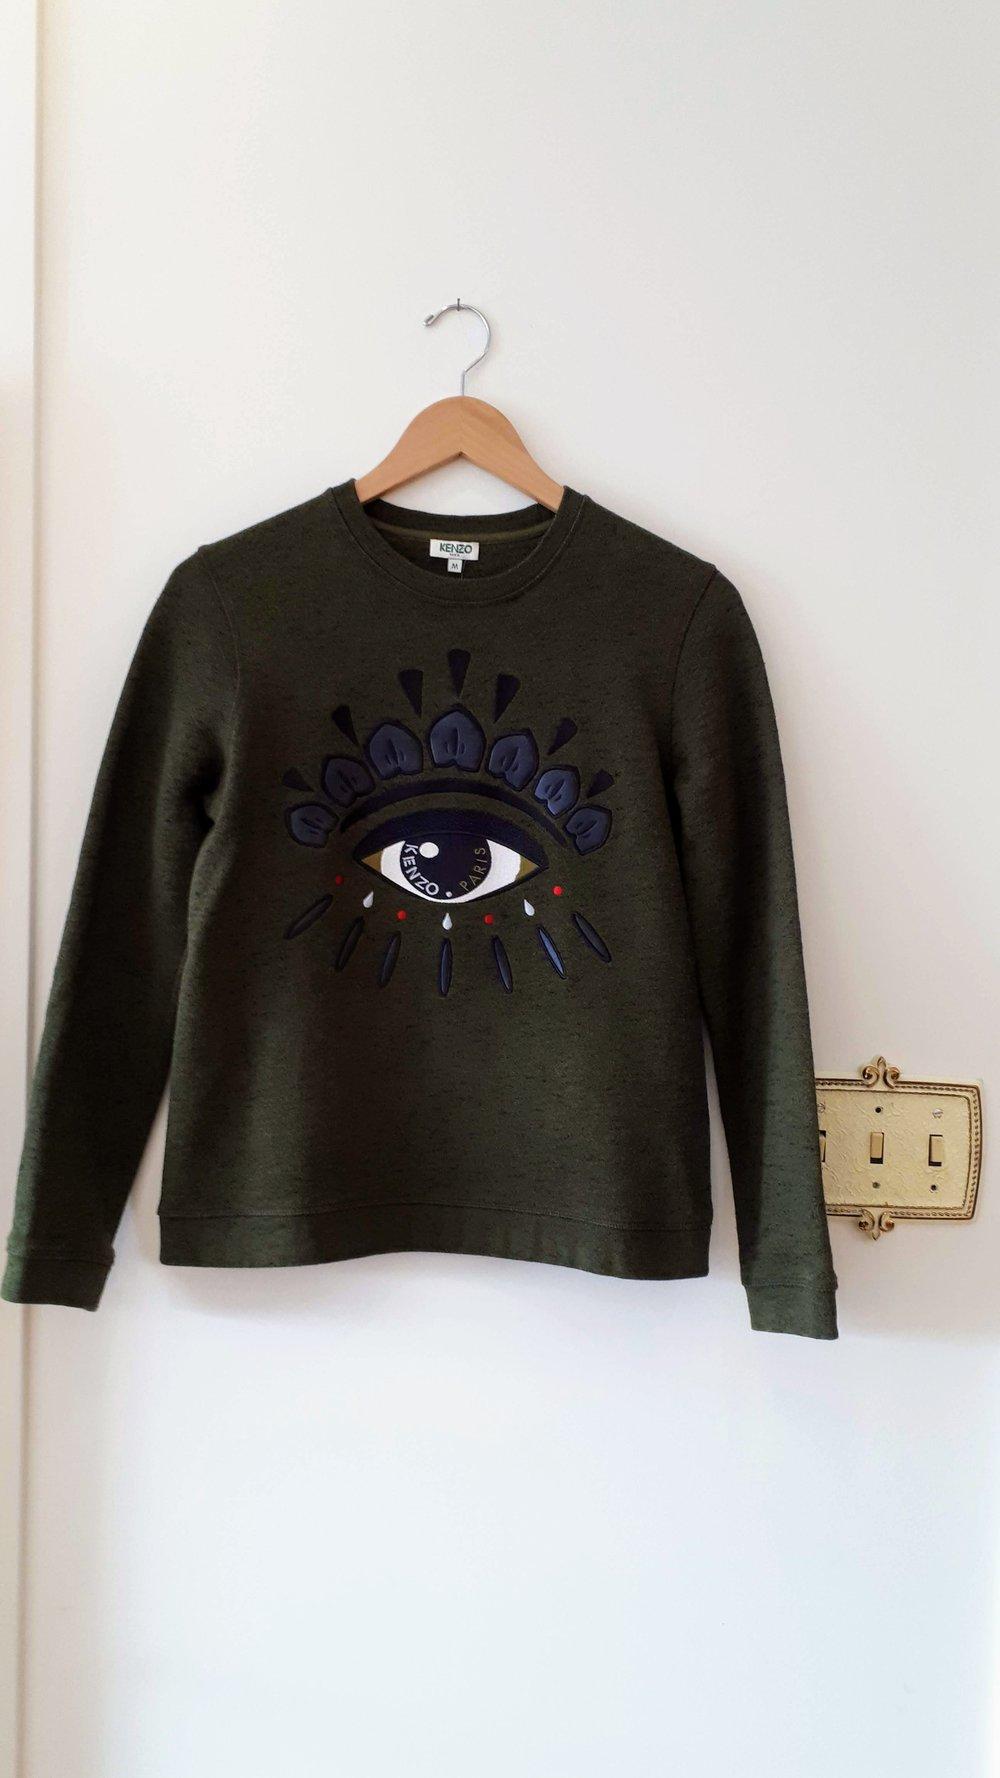 Kenzo sweater; Size M, $45